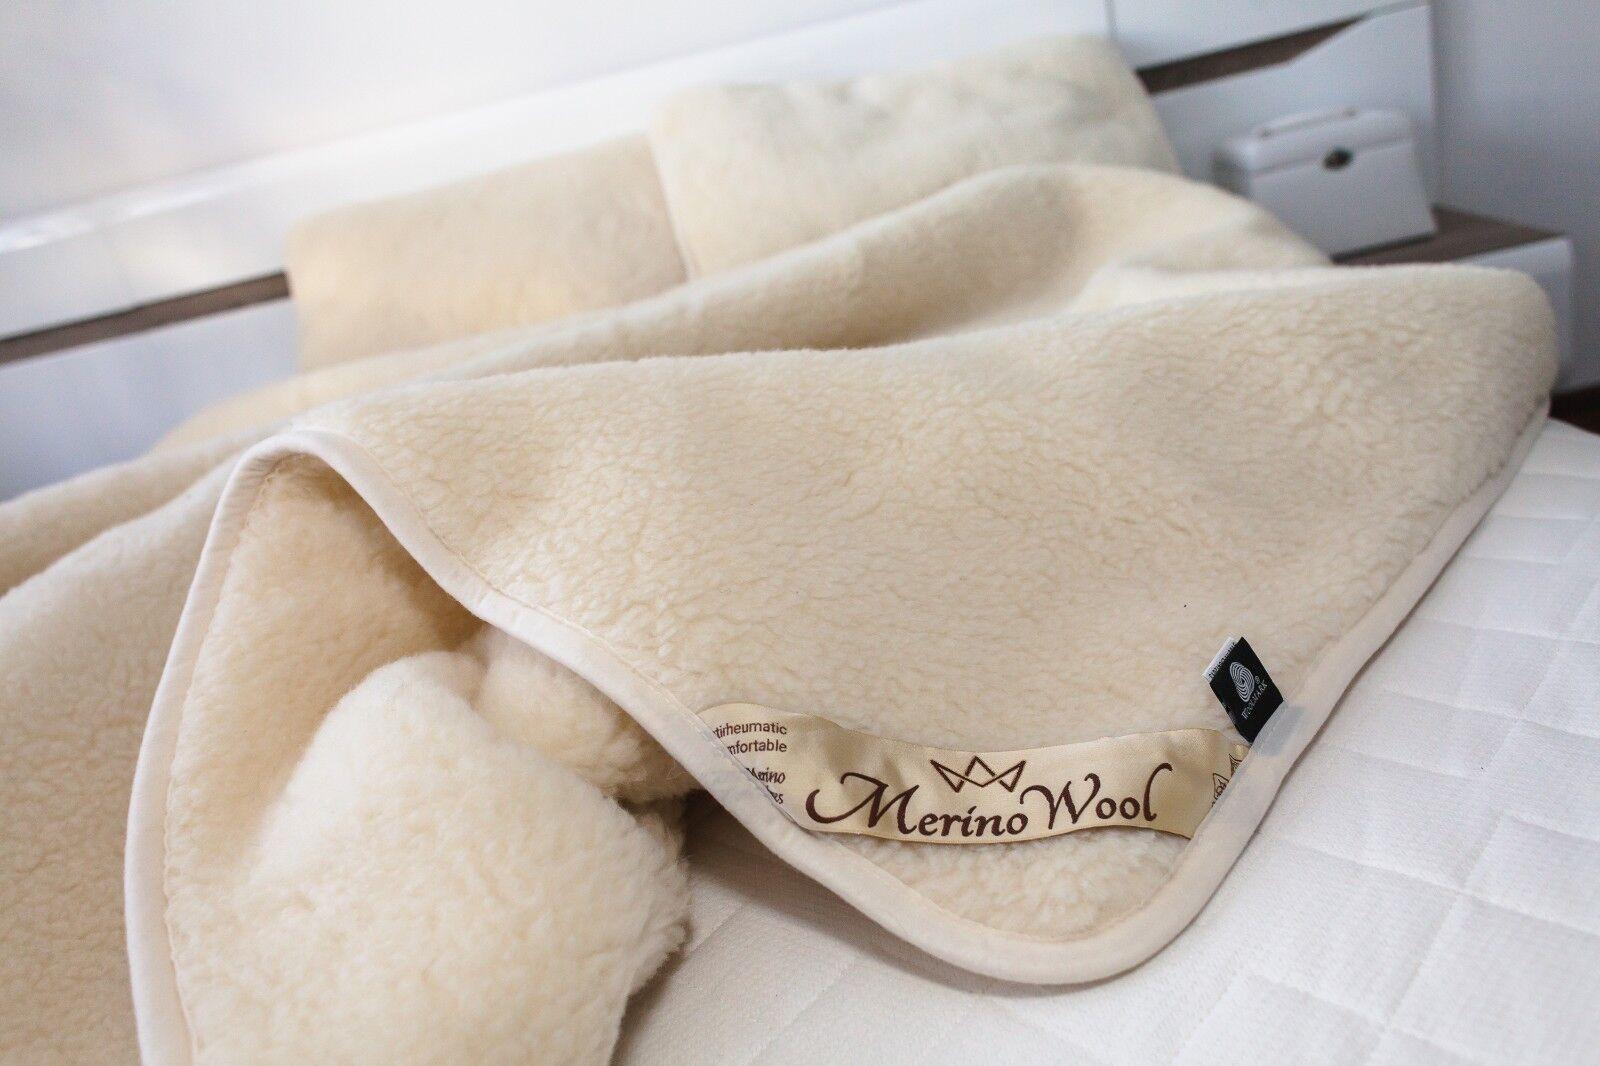 SALE Set 100% Merino Wool Over blanket Duvet Double Bed Größe +2 PILLOWS 45 75cm